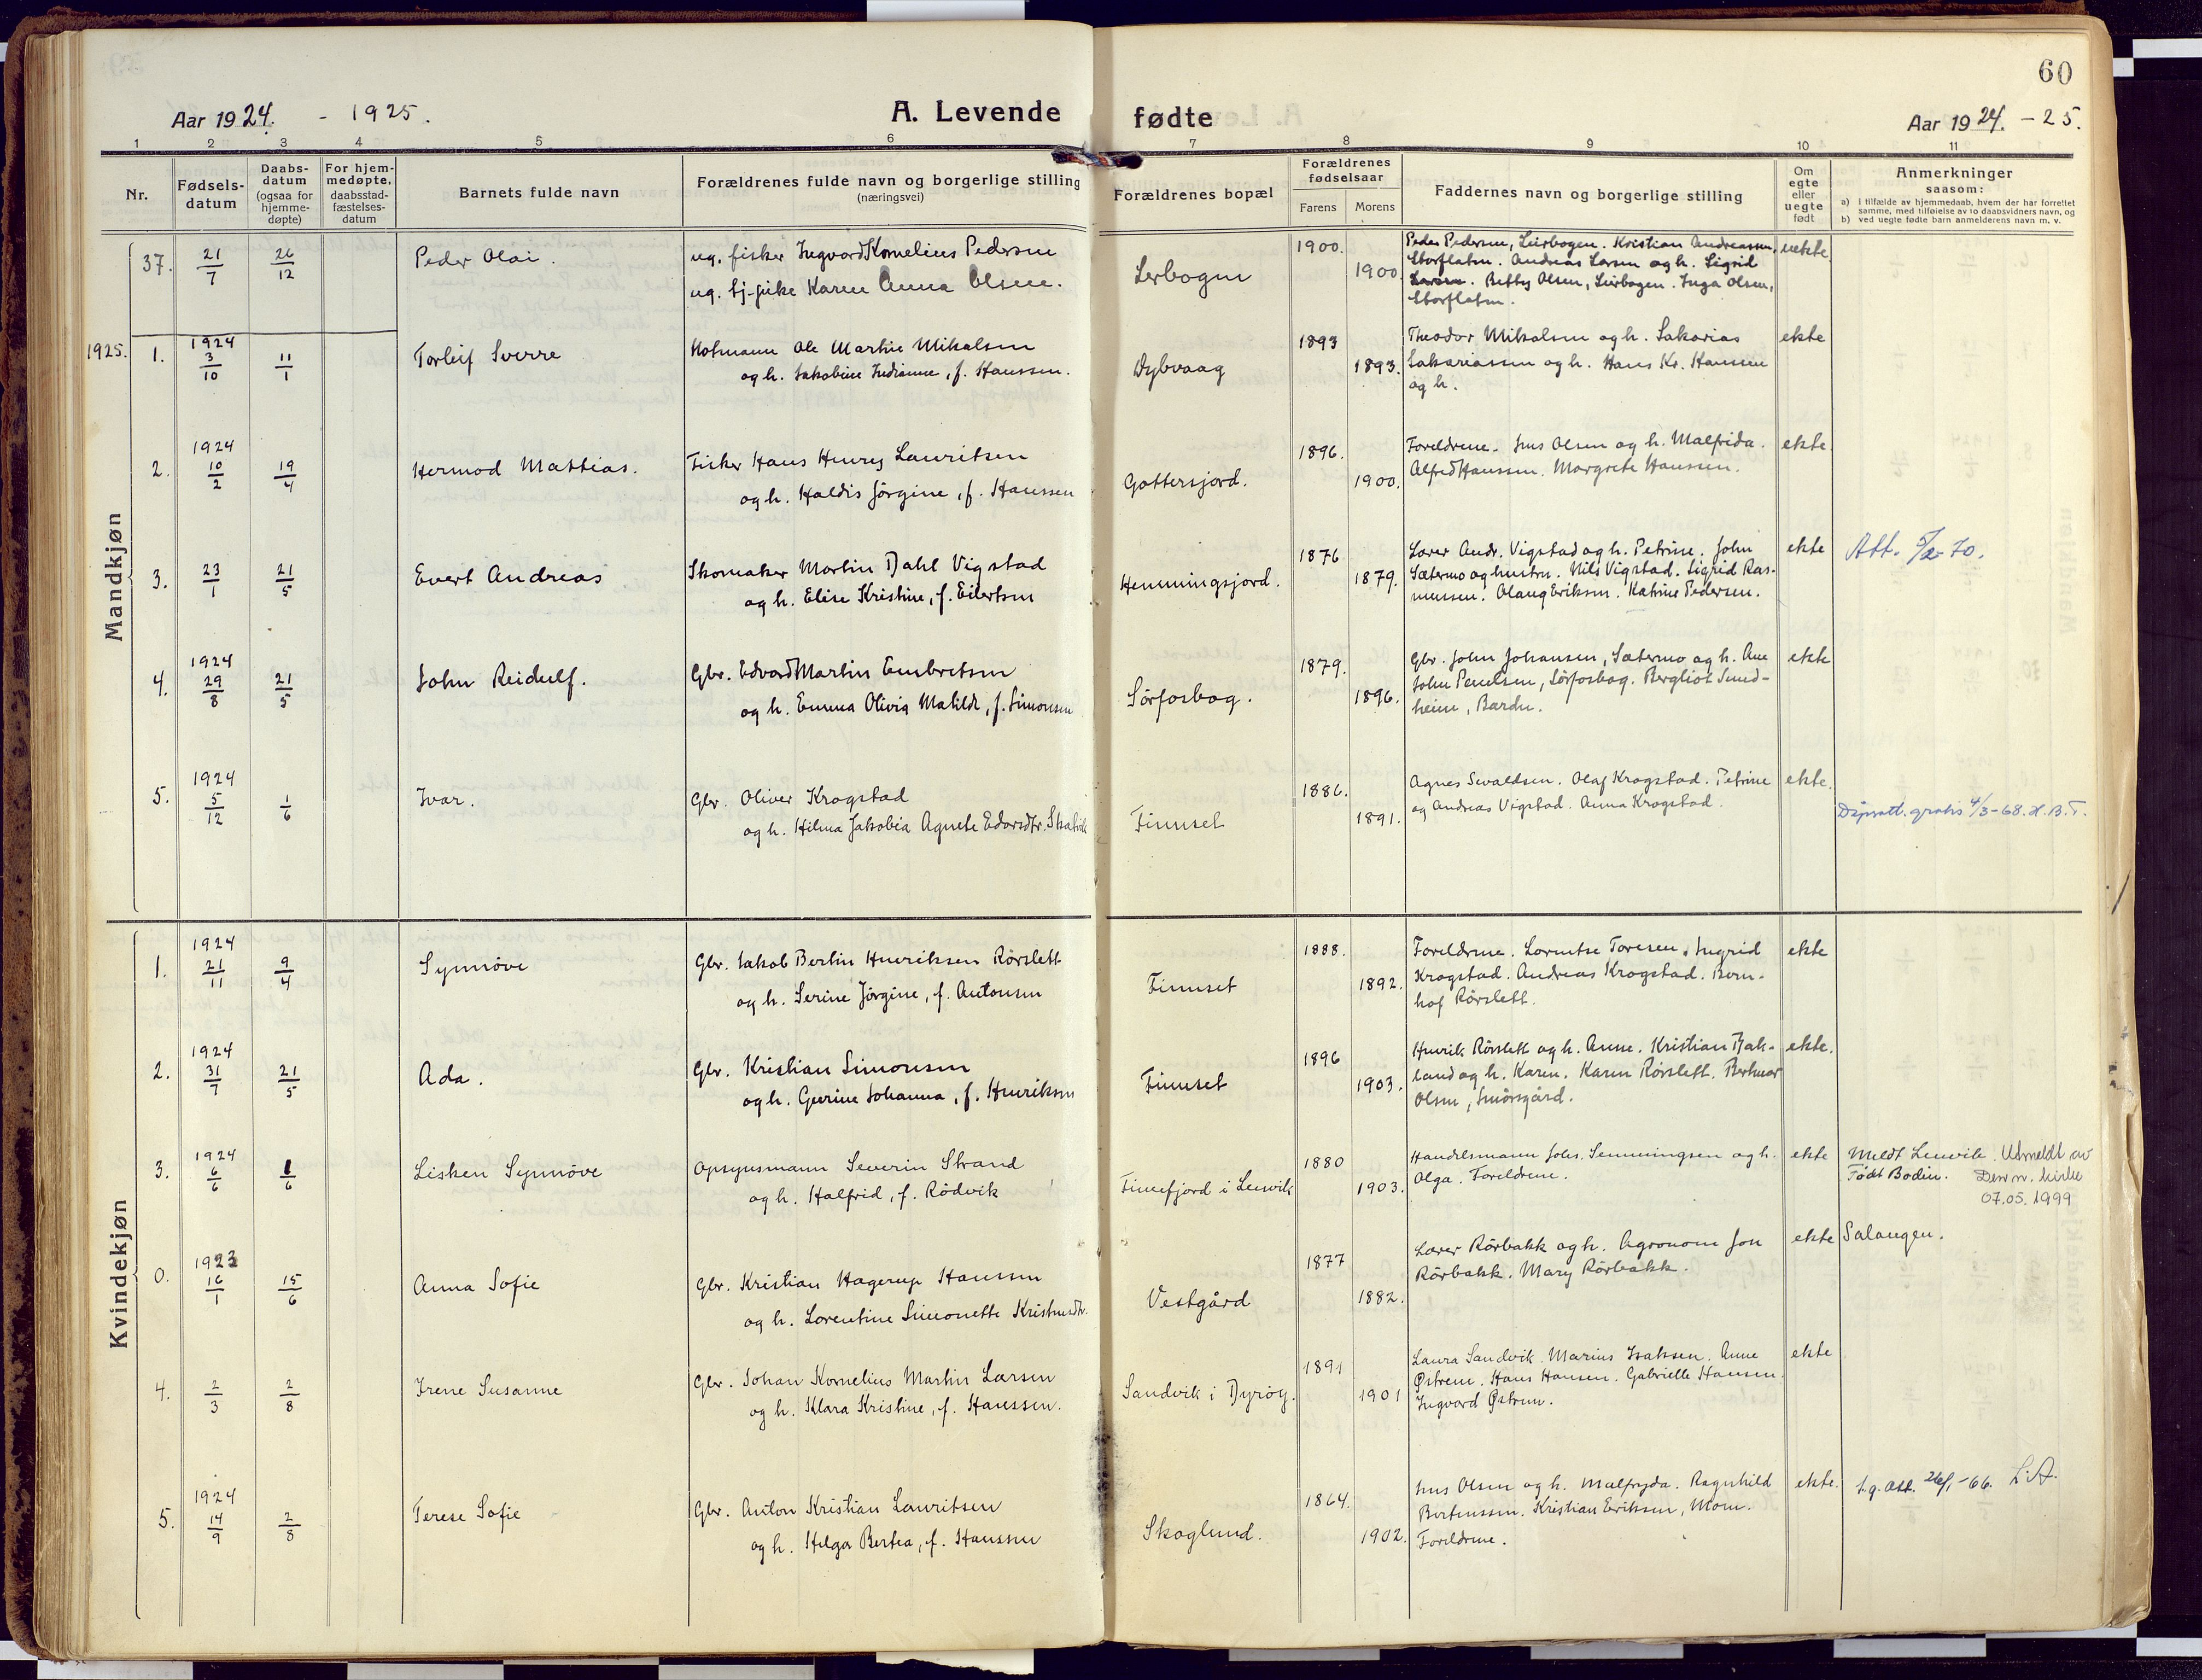 SATØ, Tranøy sokneprestkontor, I/Ia/Iaa/L0015kirke: Ministerialbok nr. 15, 1919-1928, s. 60